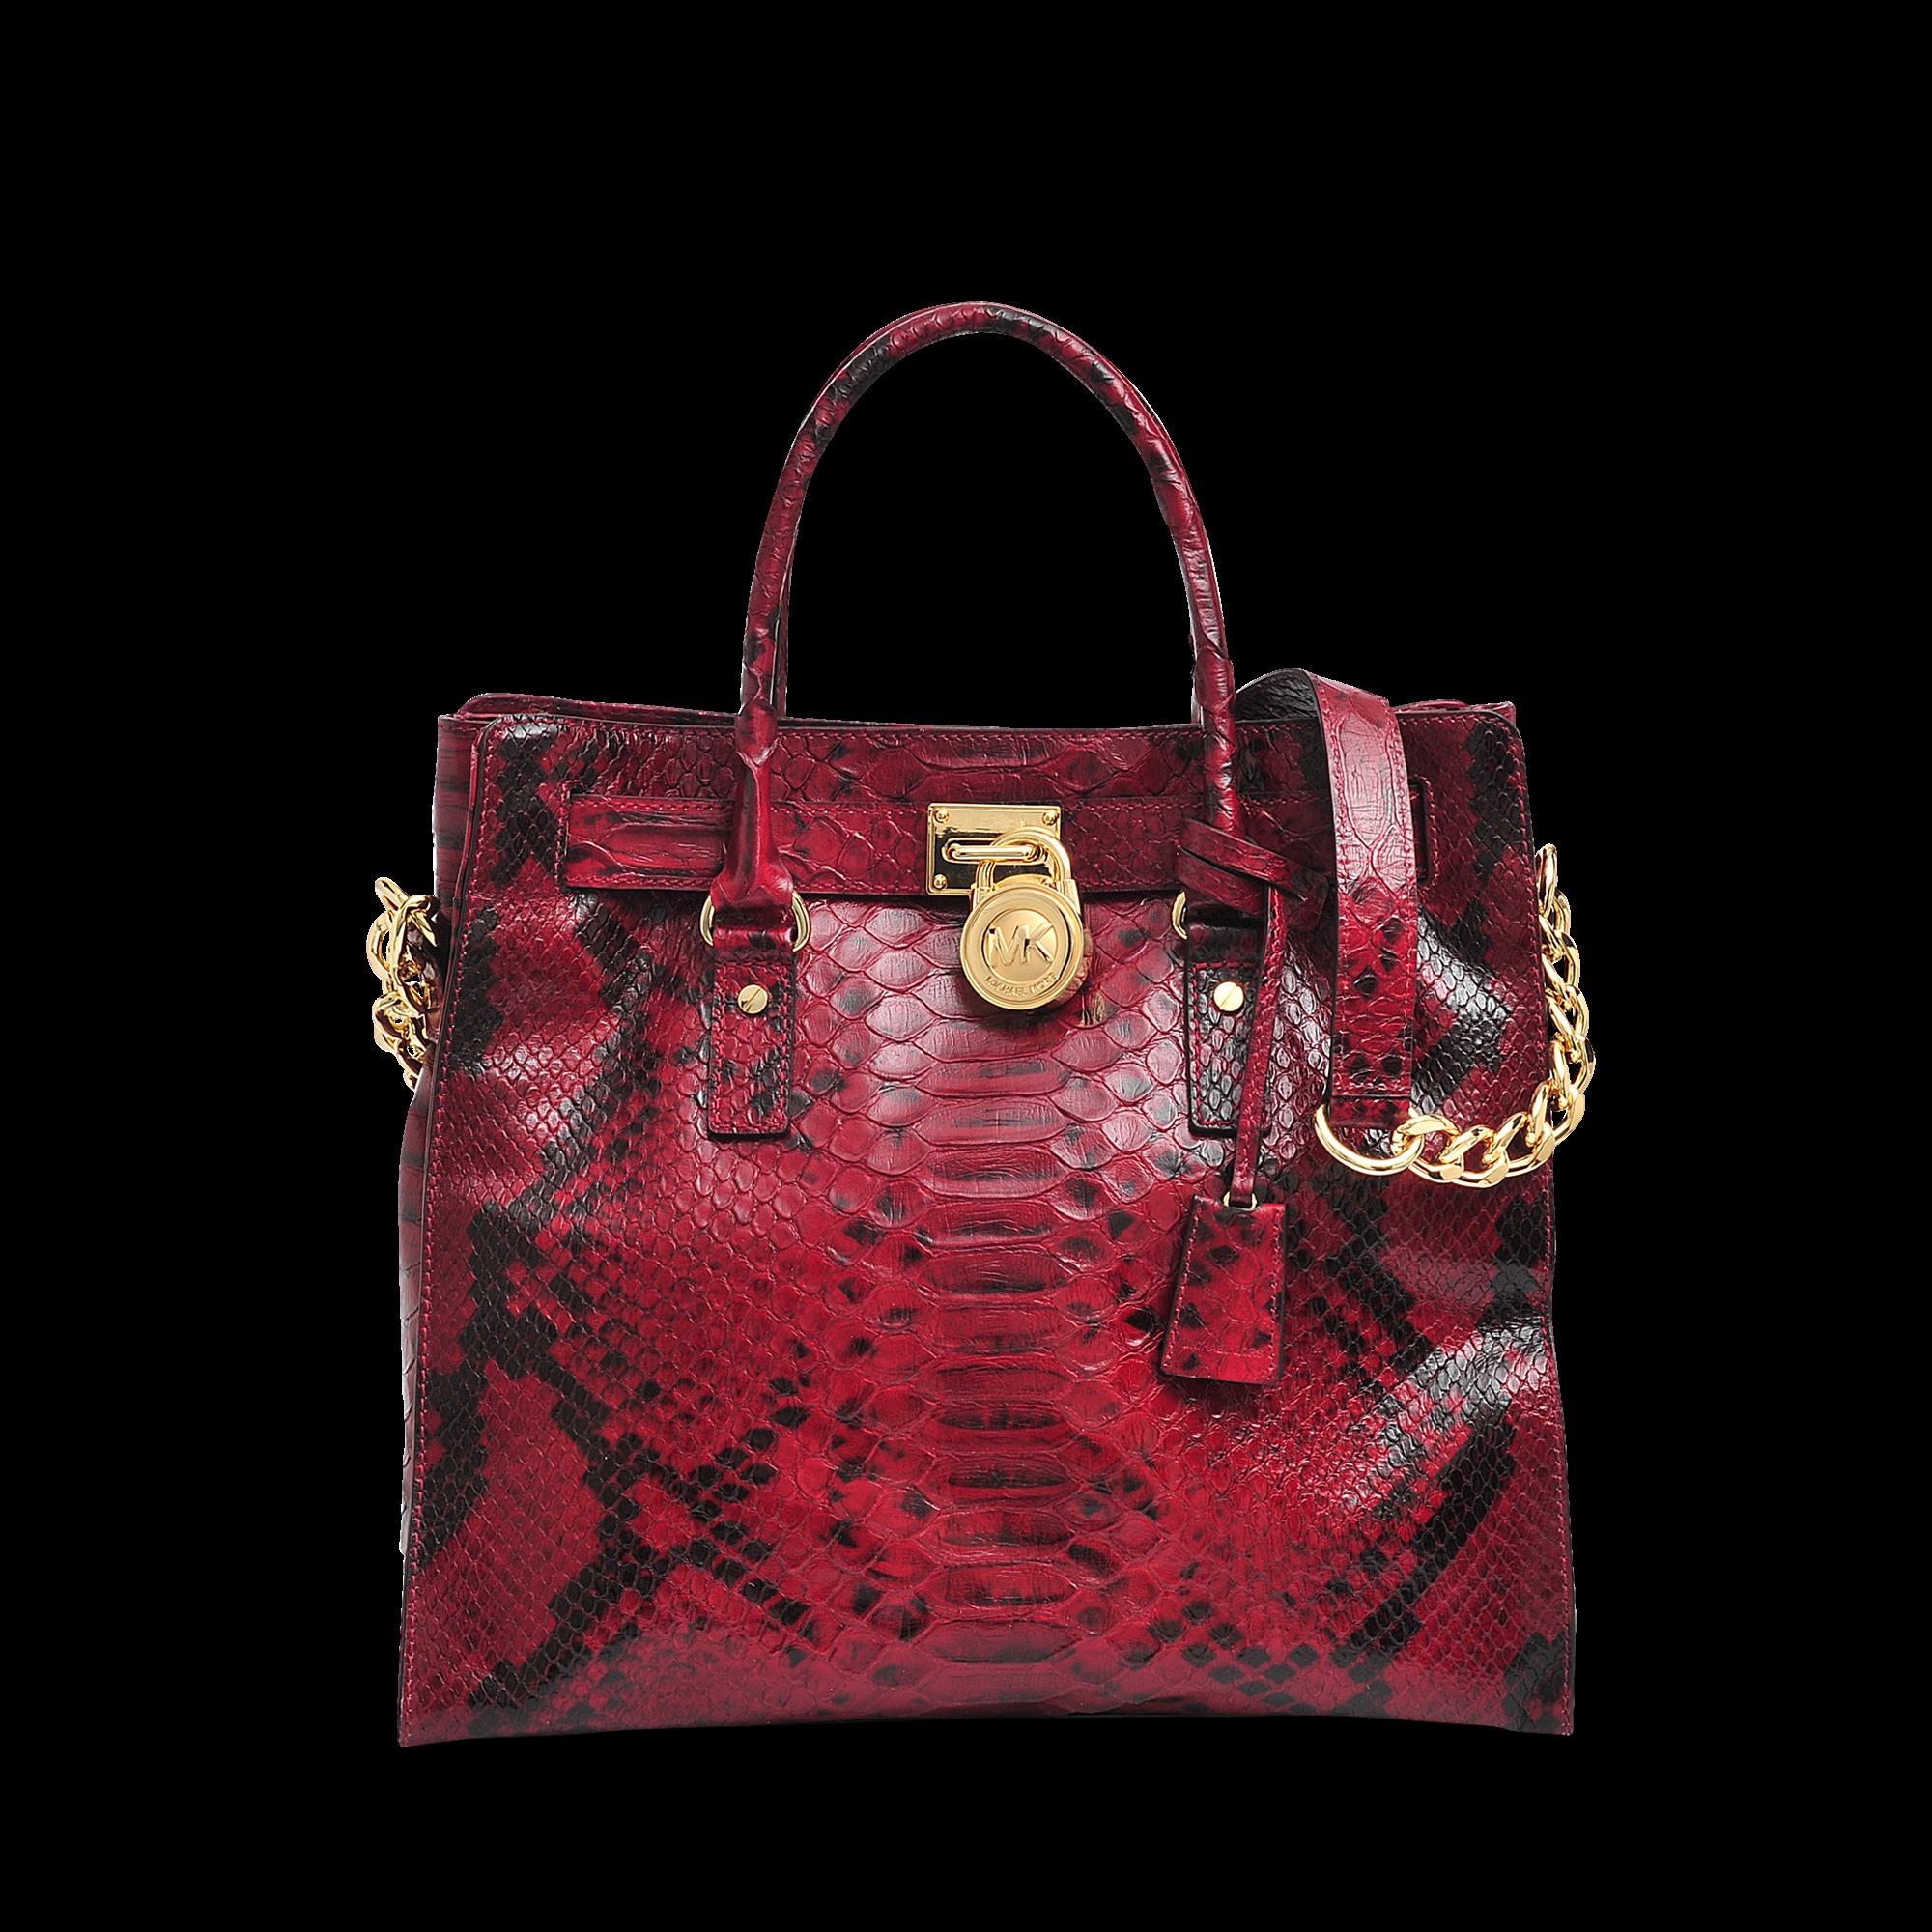 06b1f474736f74 Michael Kors Hamilton Large Python Print Bag in Red - Lyst